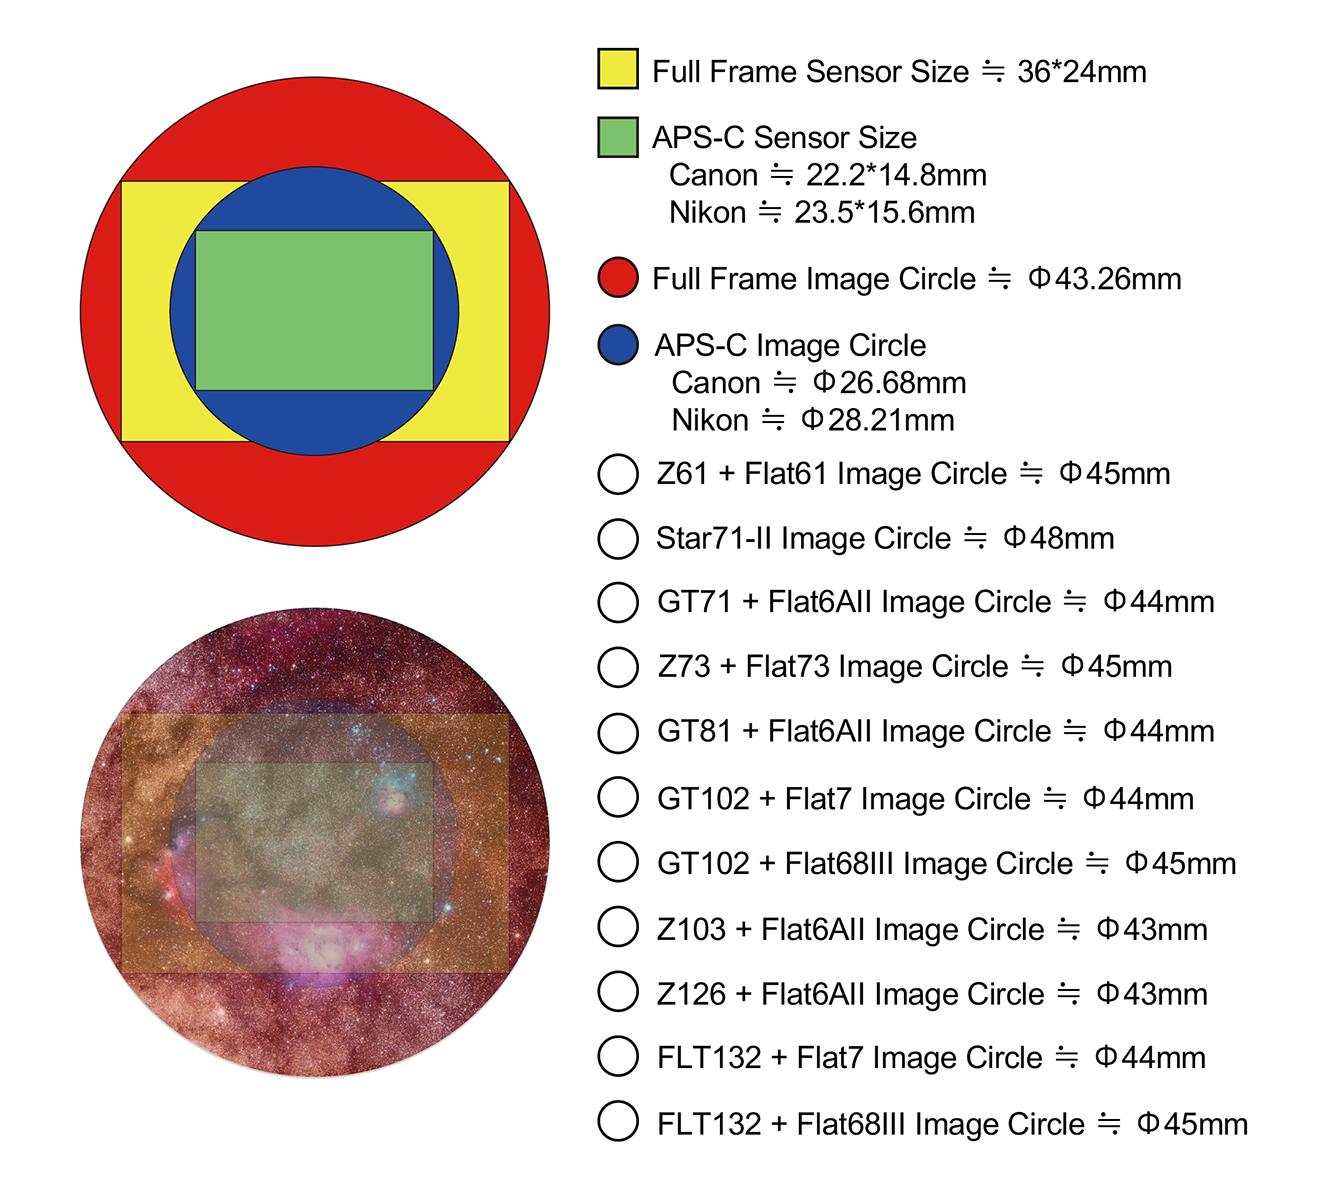 image-circle-1070320-02-01.png